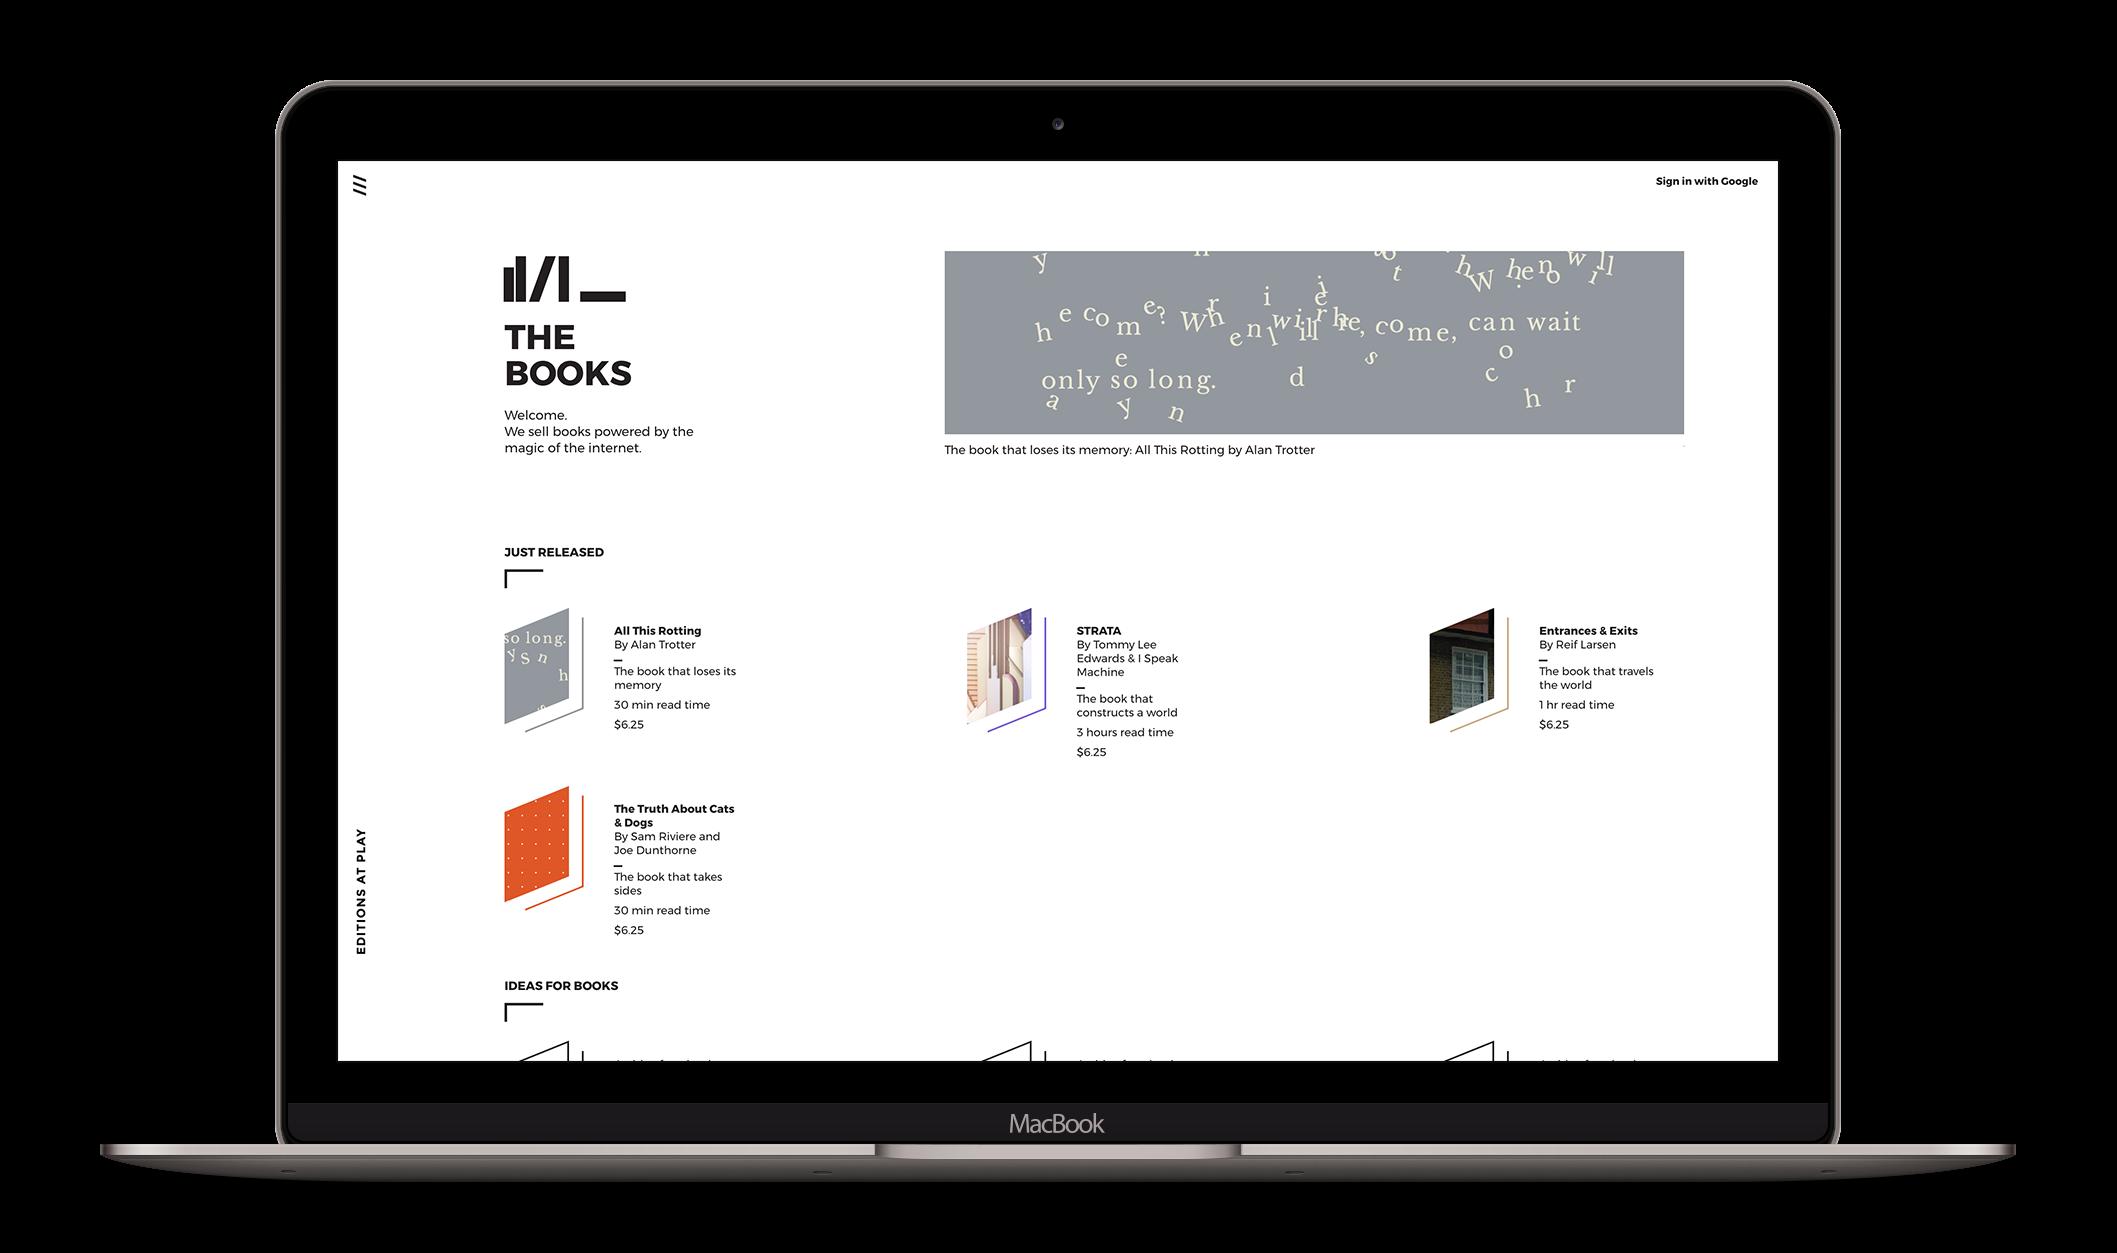 eap-home-desktop 2.png